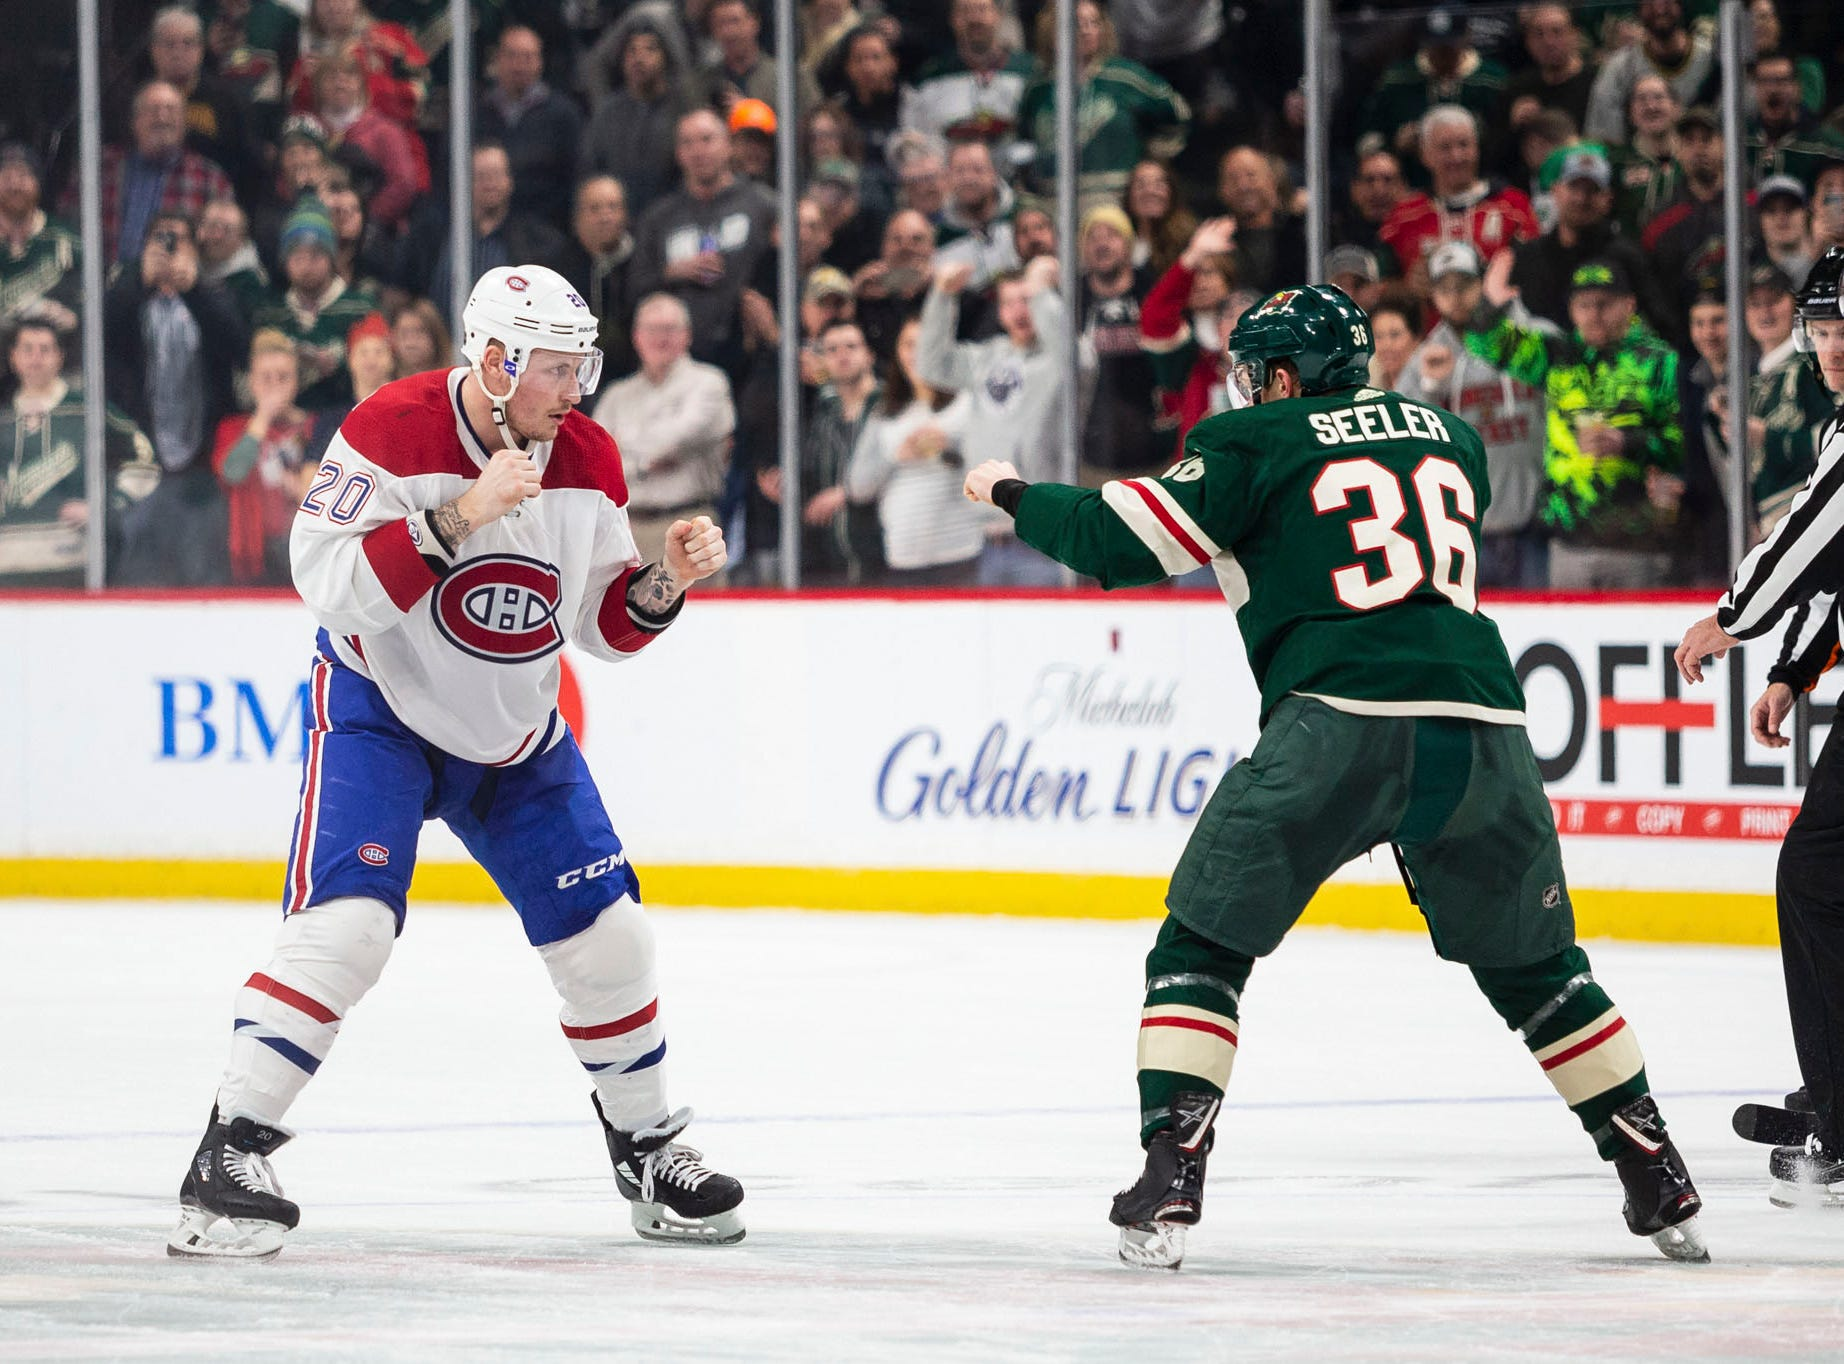 Dec. 11: Montreal Canadiens' Nicolas Deslauriers vs. Minnesota Wild's Nick Seeler.